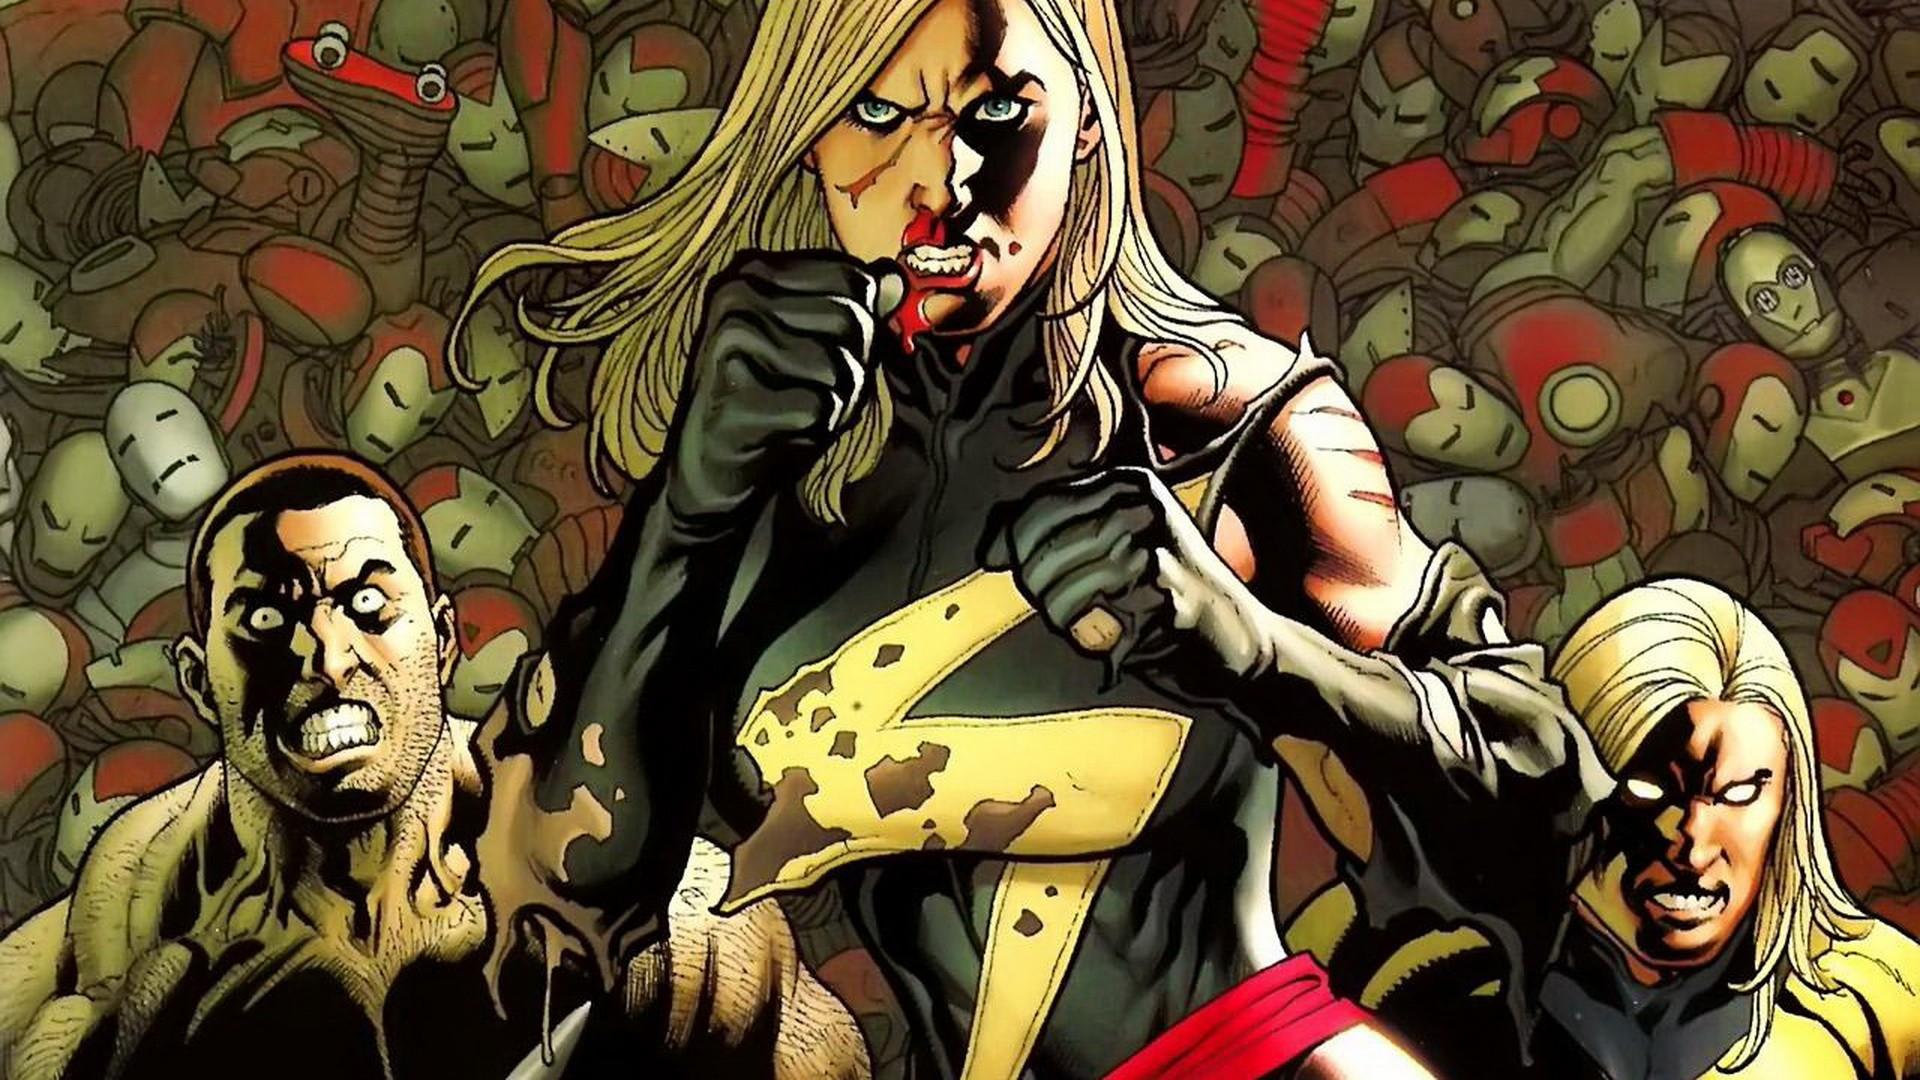 Comics Marvel Comics Ms  Marvel comics girls Luke Cage 1920x1080